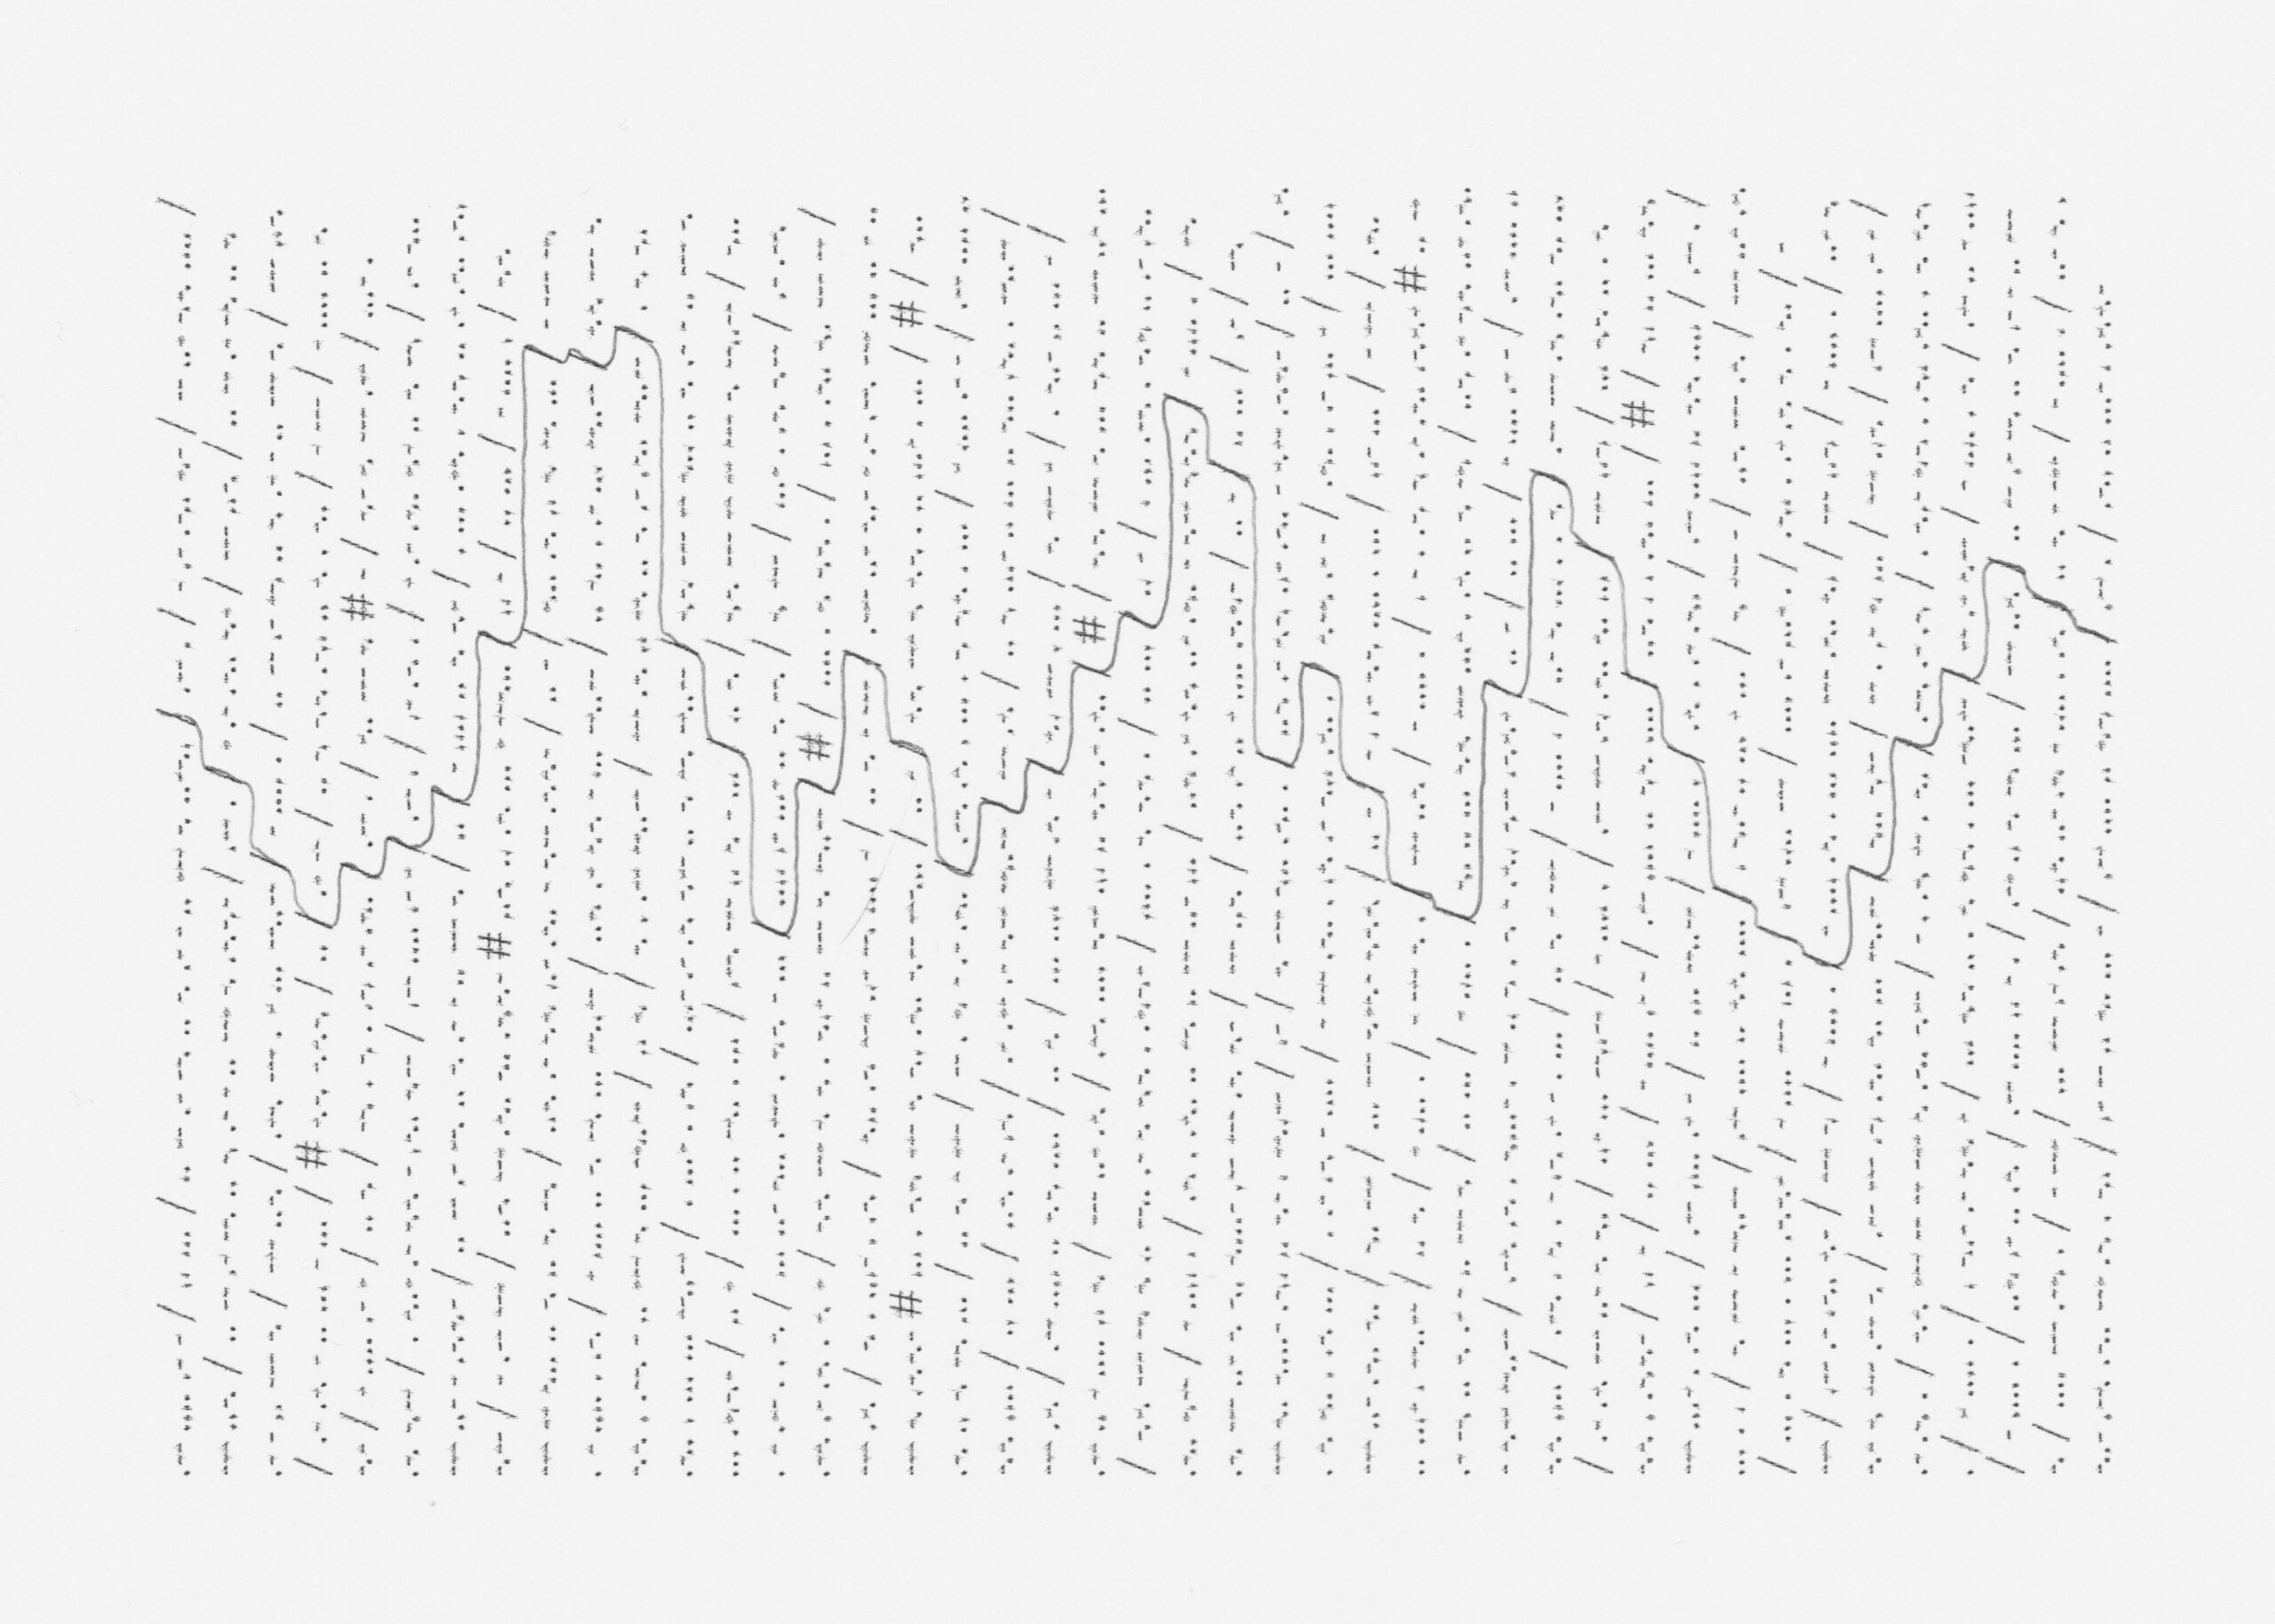 A_2020_04_23_scans_total_morseknittingScan-21